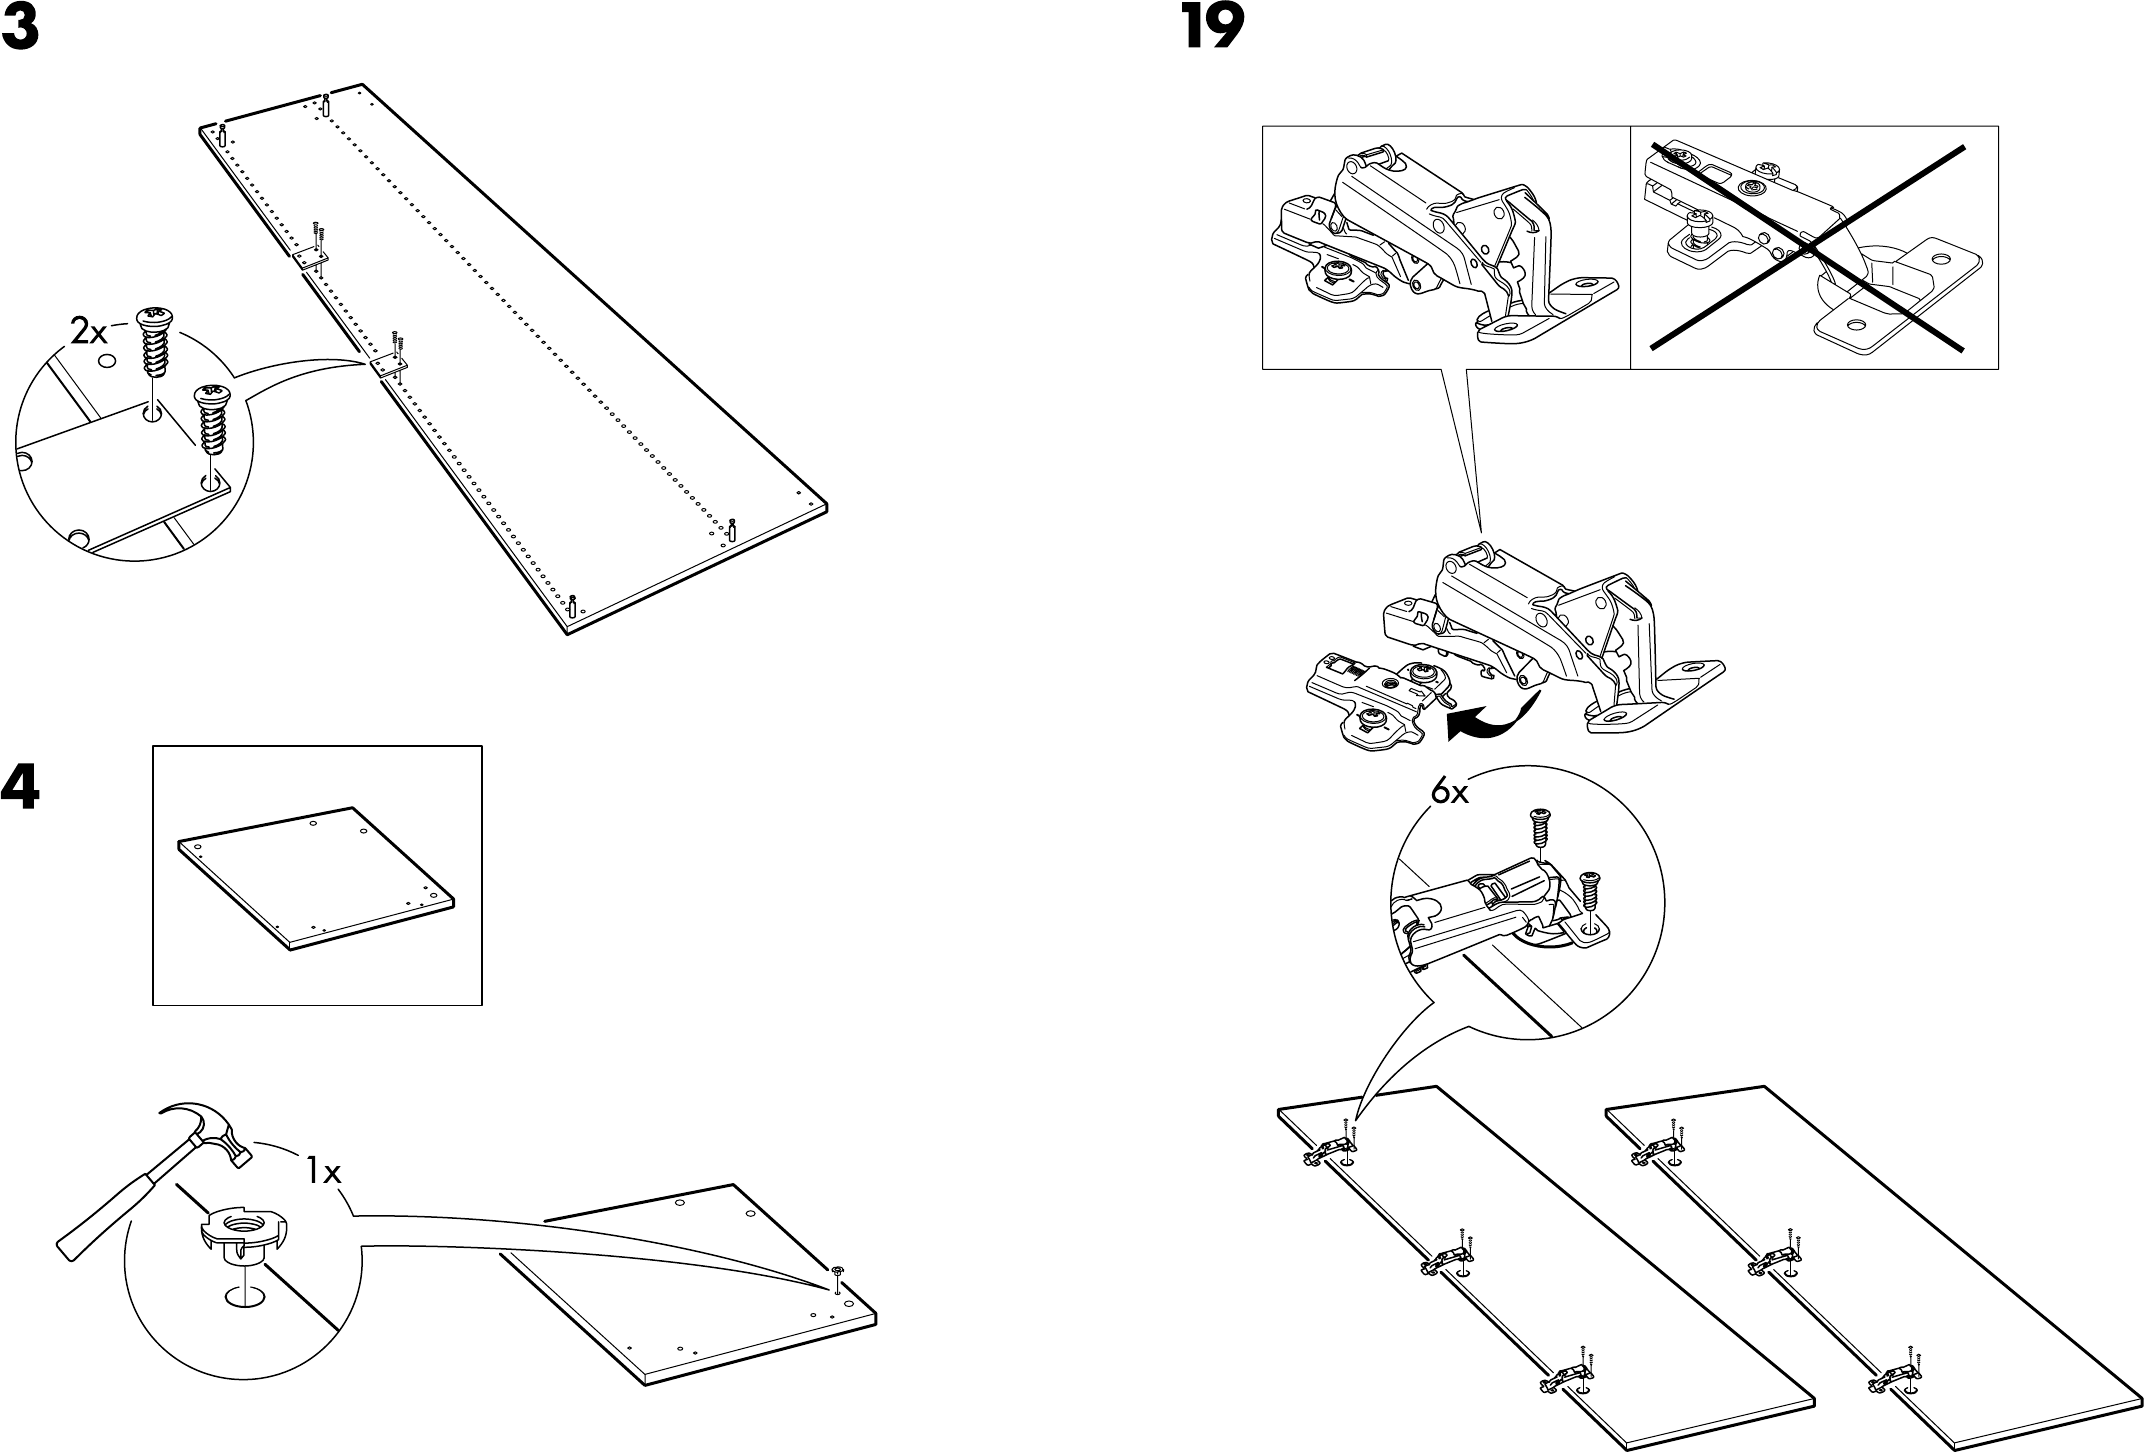 Handleiding Ikea Pax Hoekkast Pagina 14 Van 18 Dansk